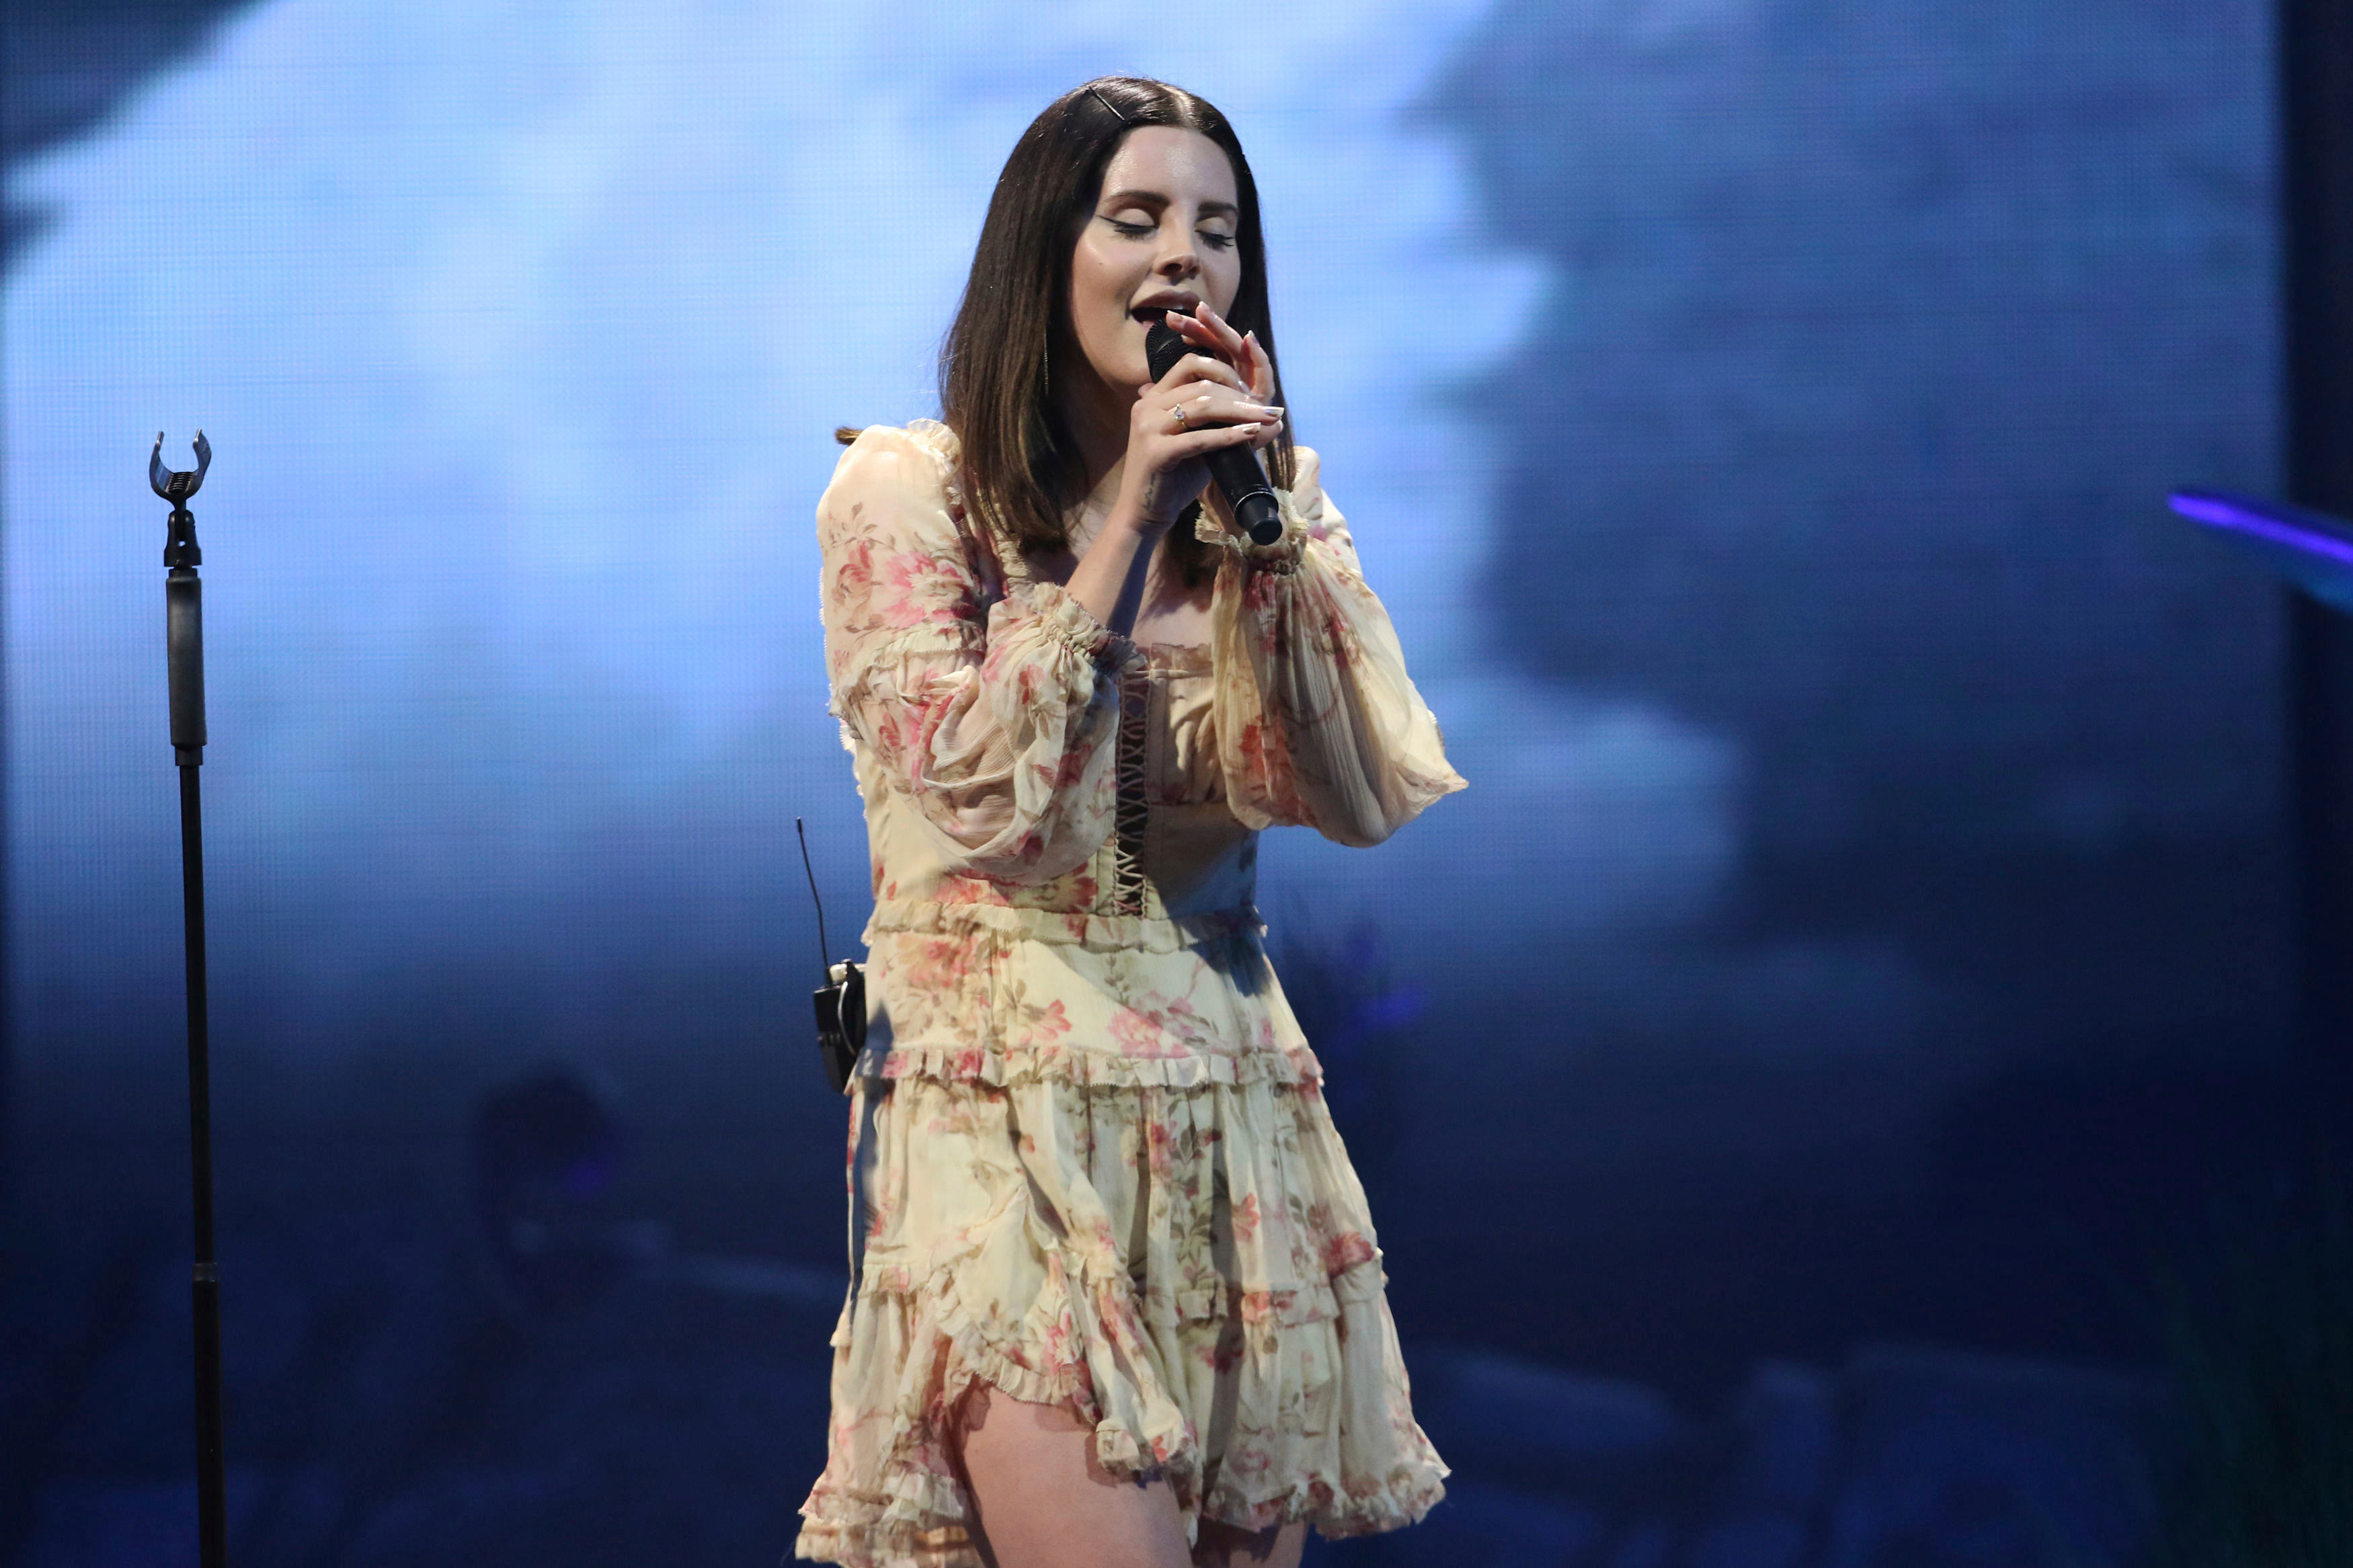 Hear Lana Del Rey Tease New Track 'Norman Fucking Rockwell'